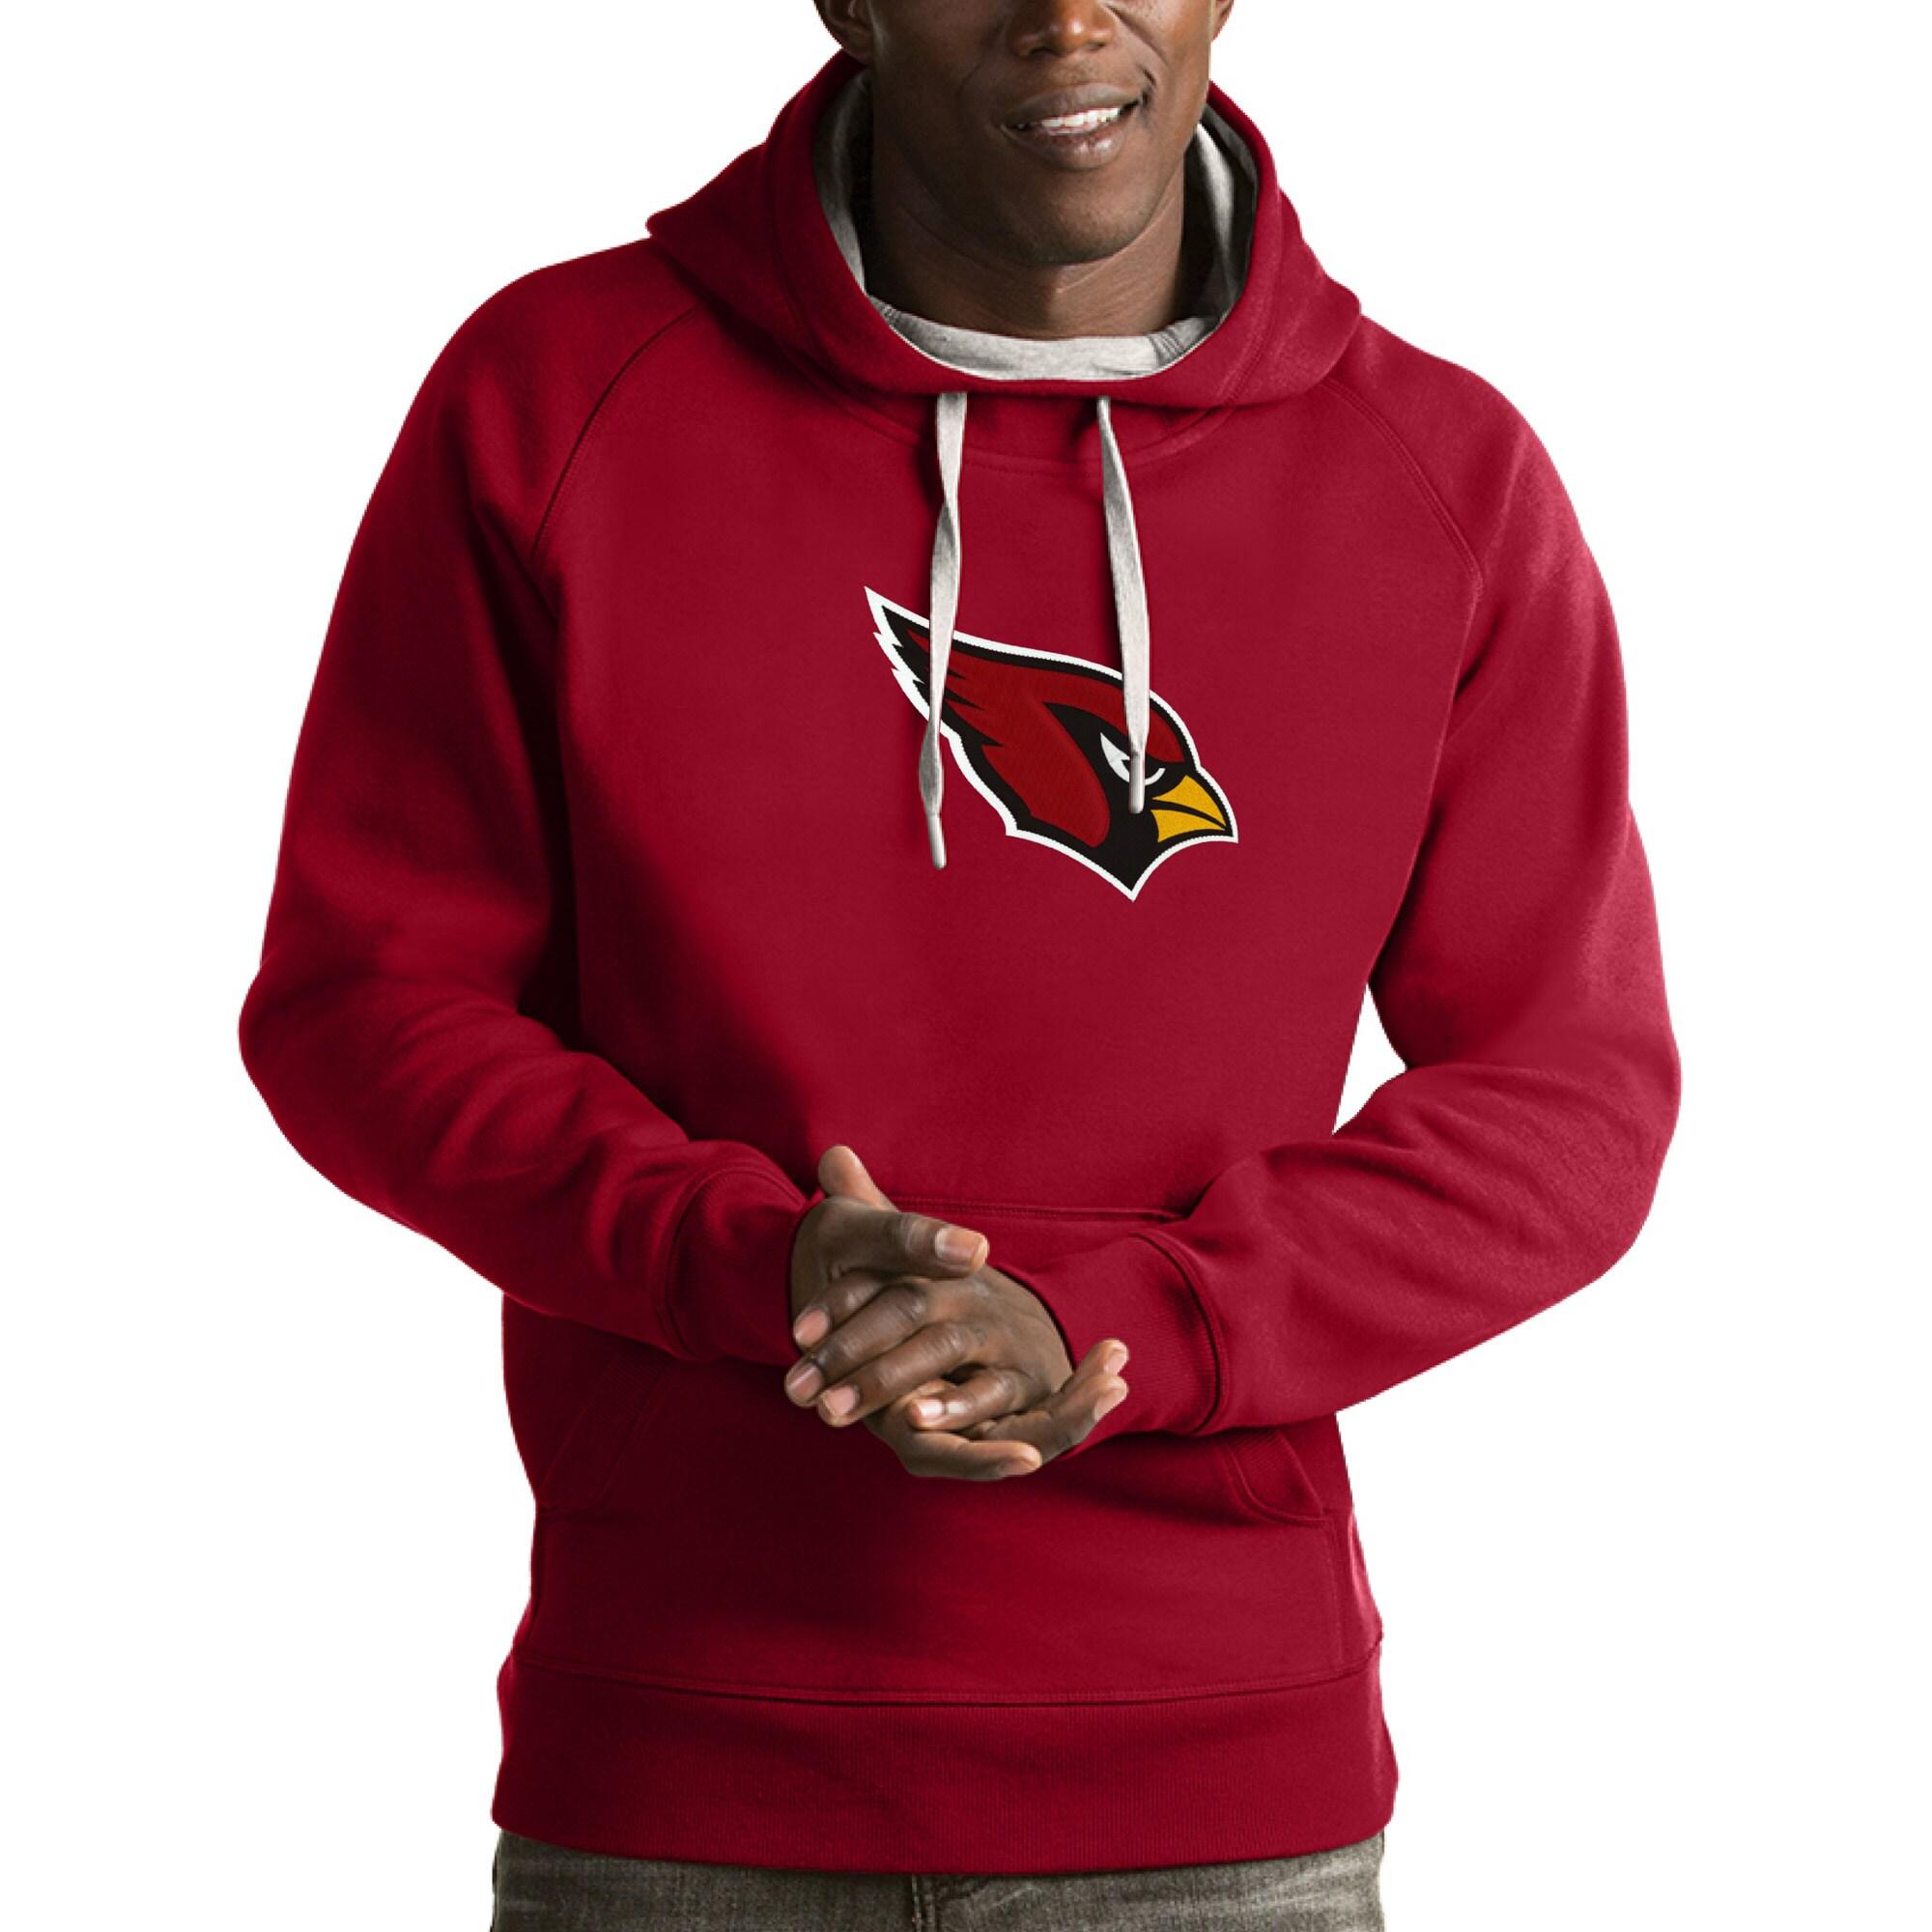 Arizona Cardinals Antigua Victory Pullover Hoodie - Cardinal